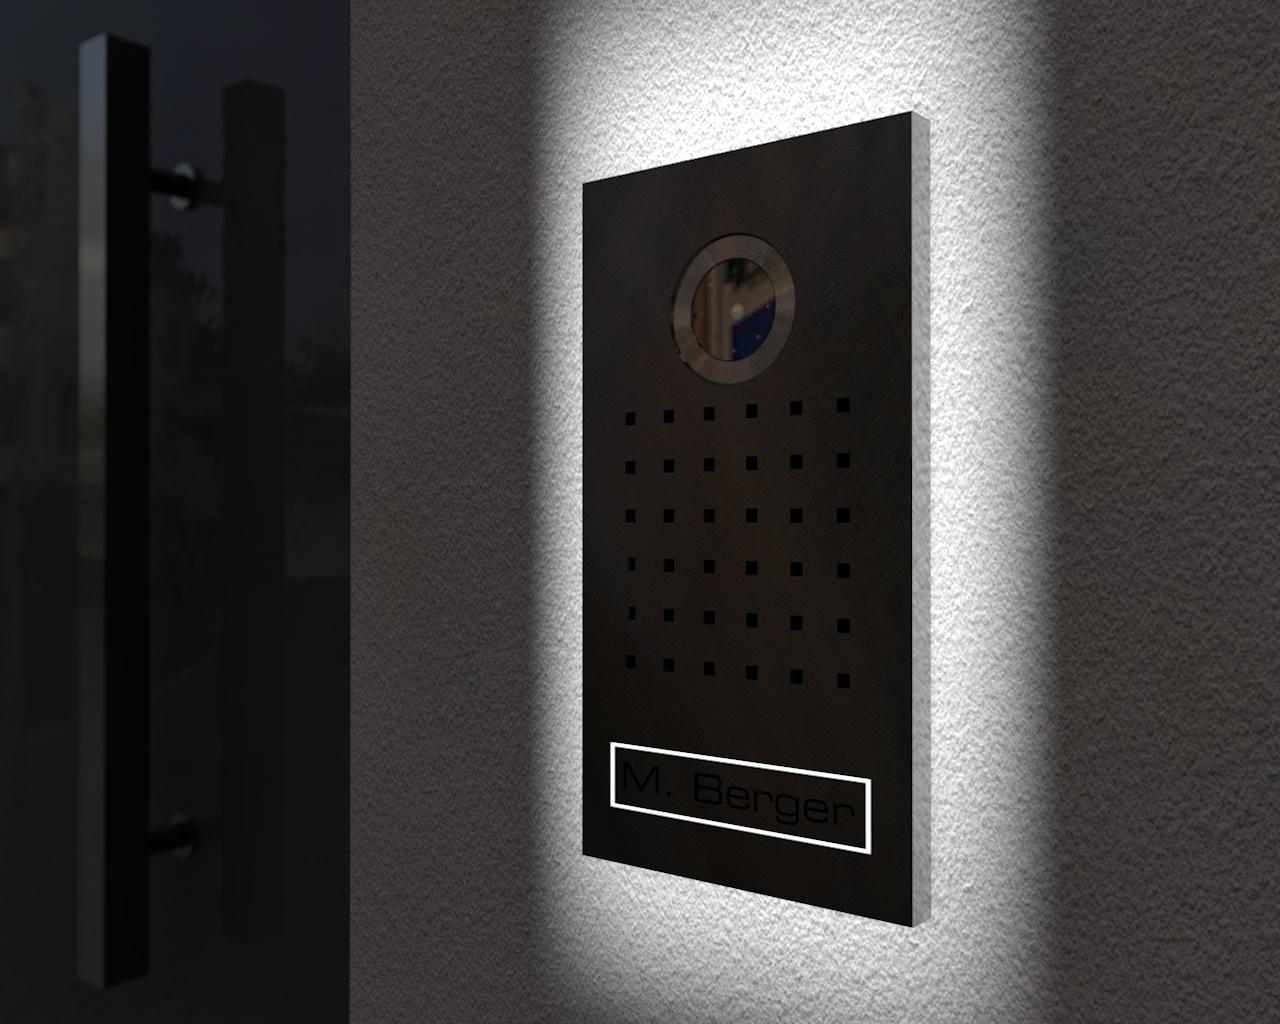 video t rsprechanlage mit 7 zoll touchscreen monitor. Black Bedroom Furniture Sets. Home Design Ideas